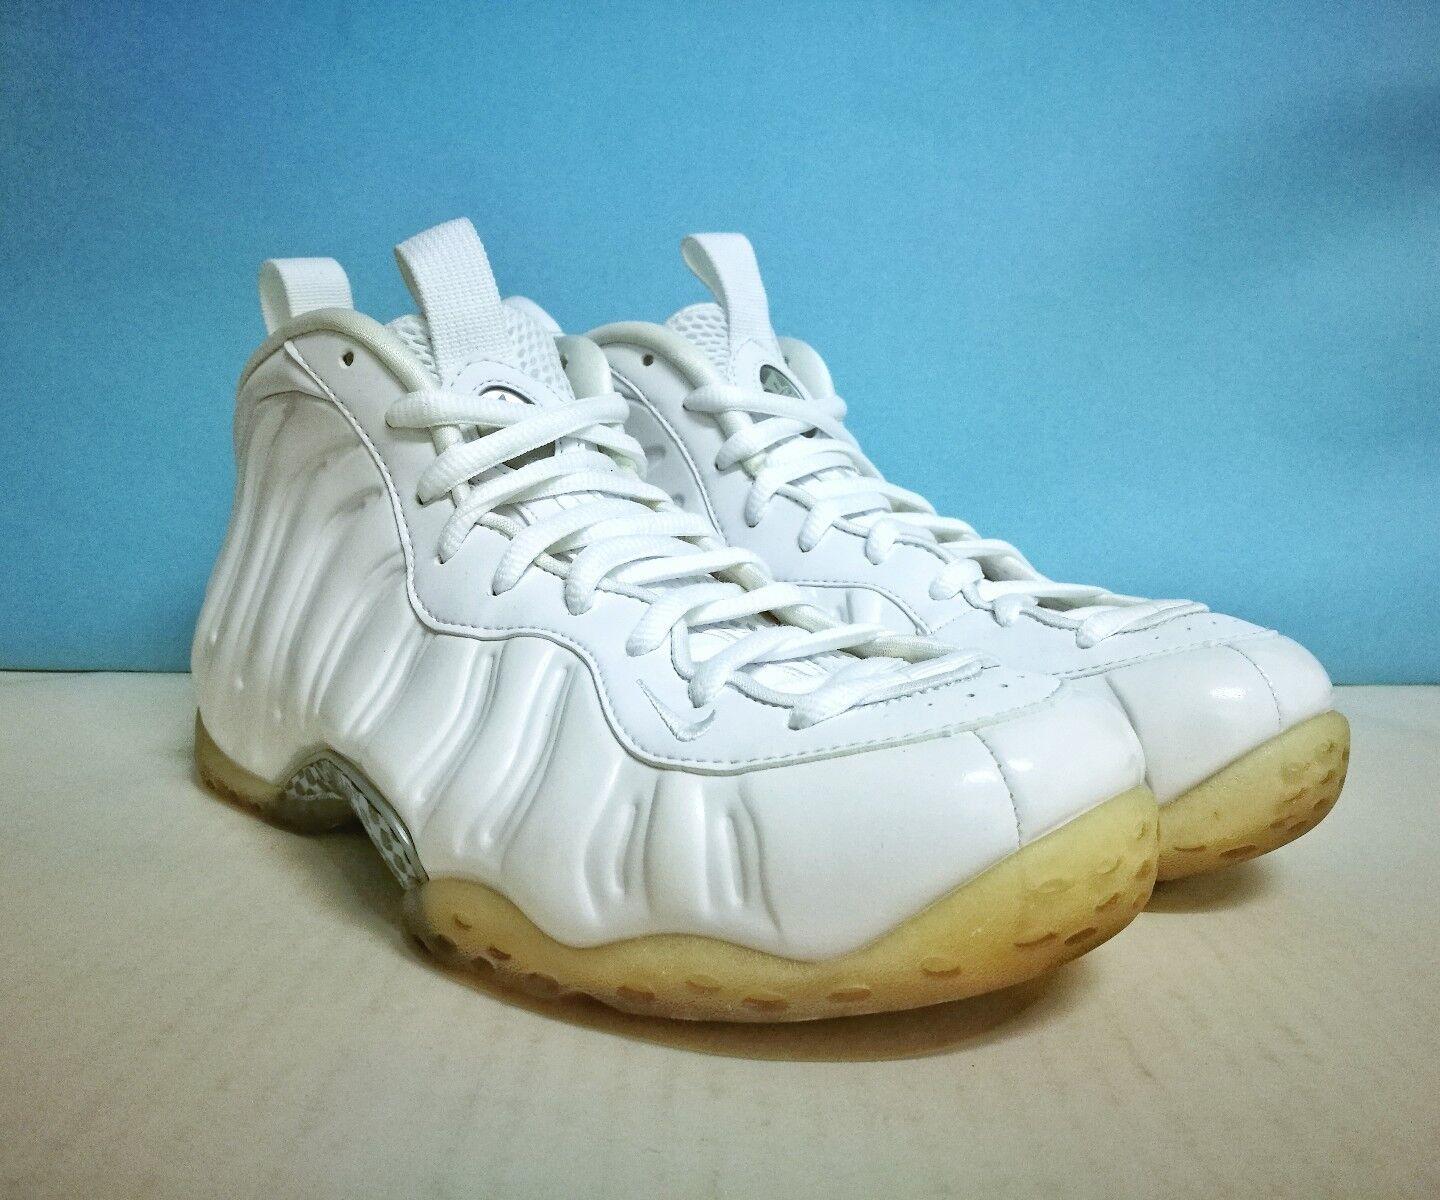 Nike Air OUT Foamposite One ++ blanc OUT Air ++ sz 9 US 42.5 EU 314996 100 Jordan Yeezy 2bafa0